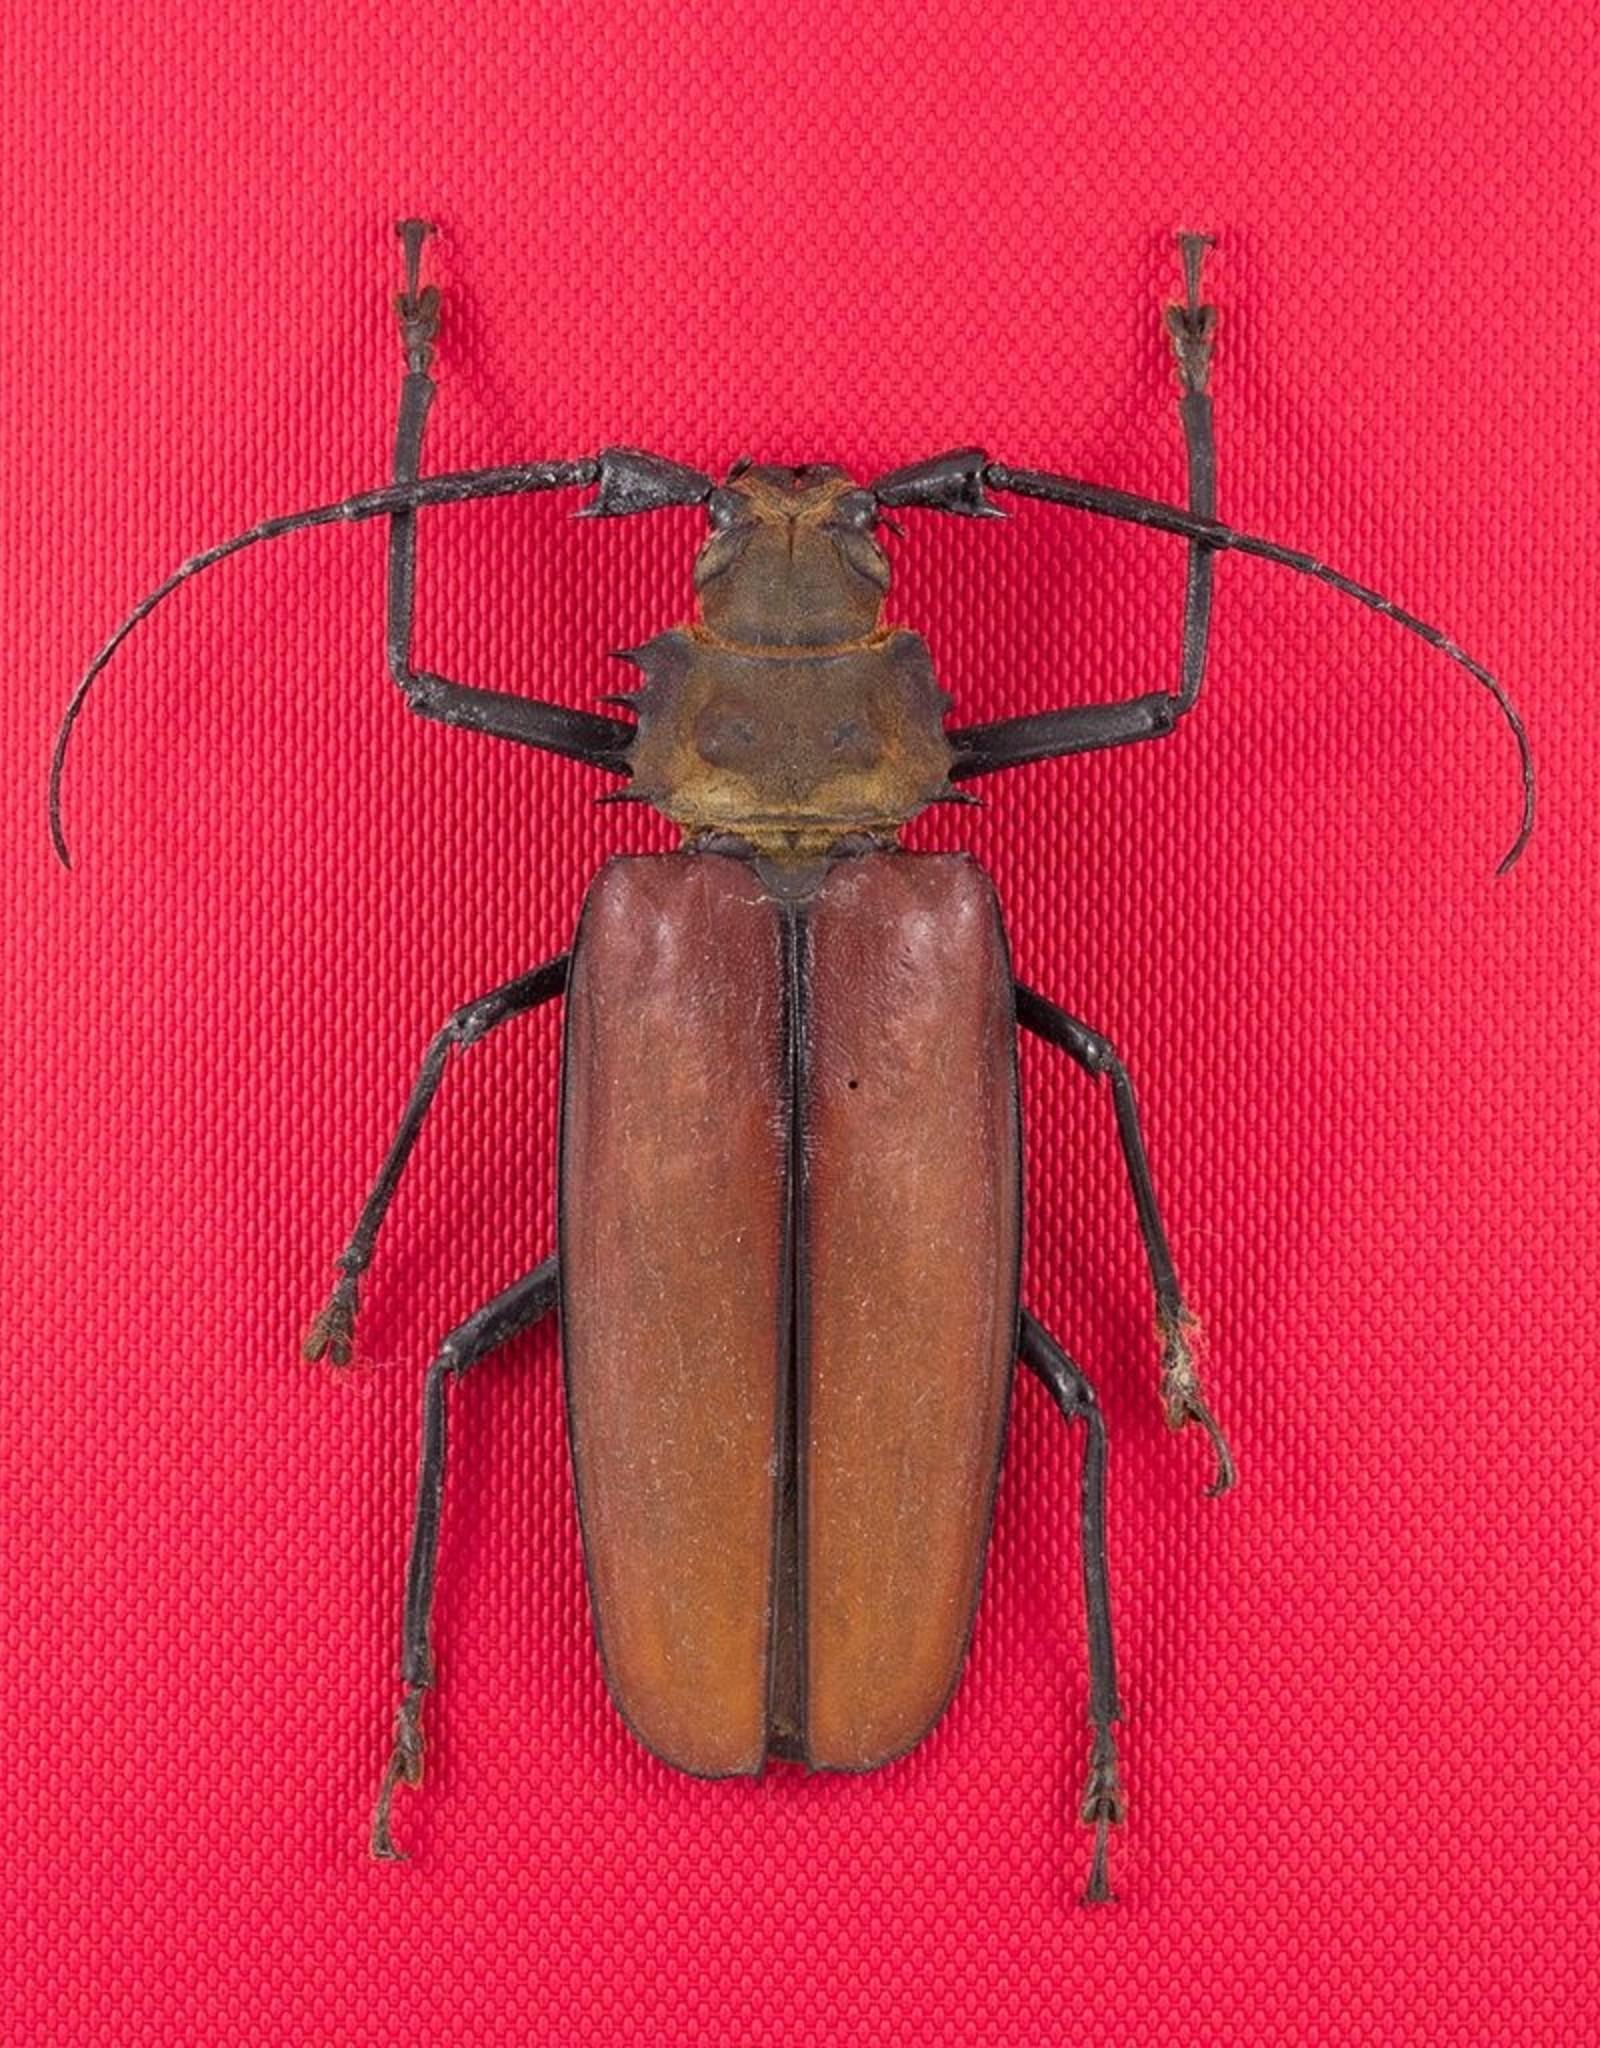 Callipogon (Enopluceros) armillatus M A1 Peru 9.5 cm